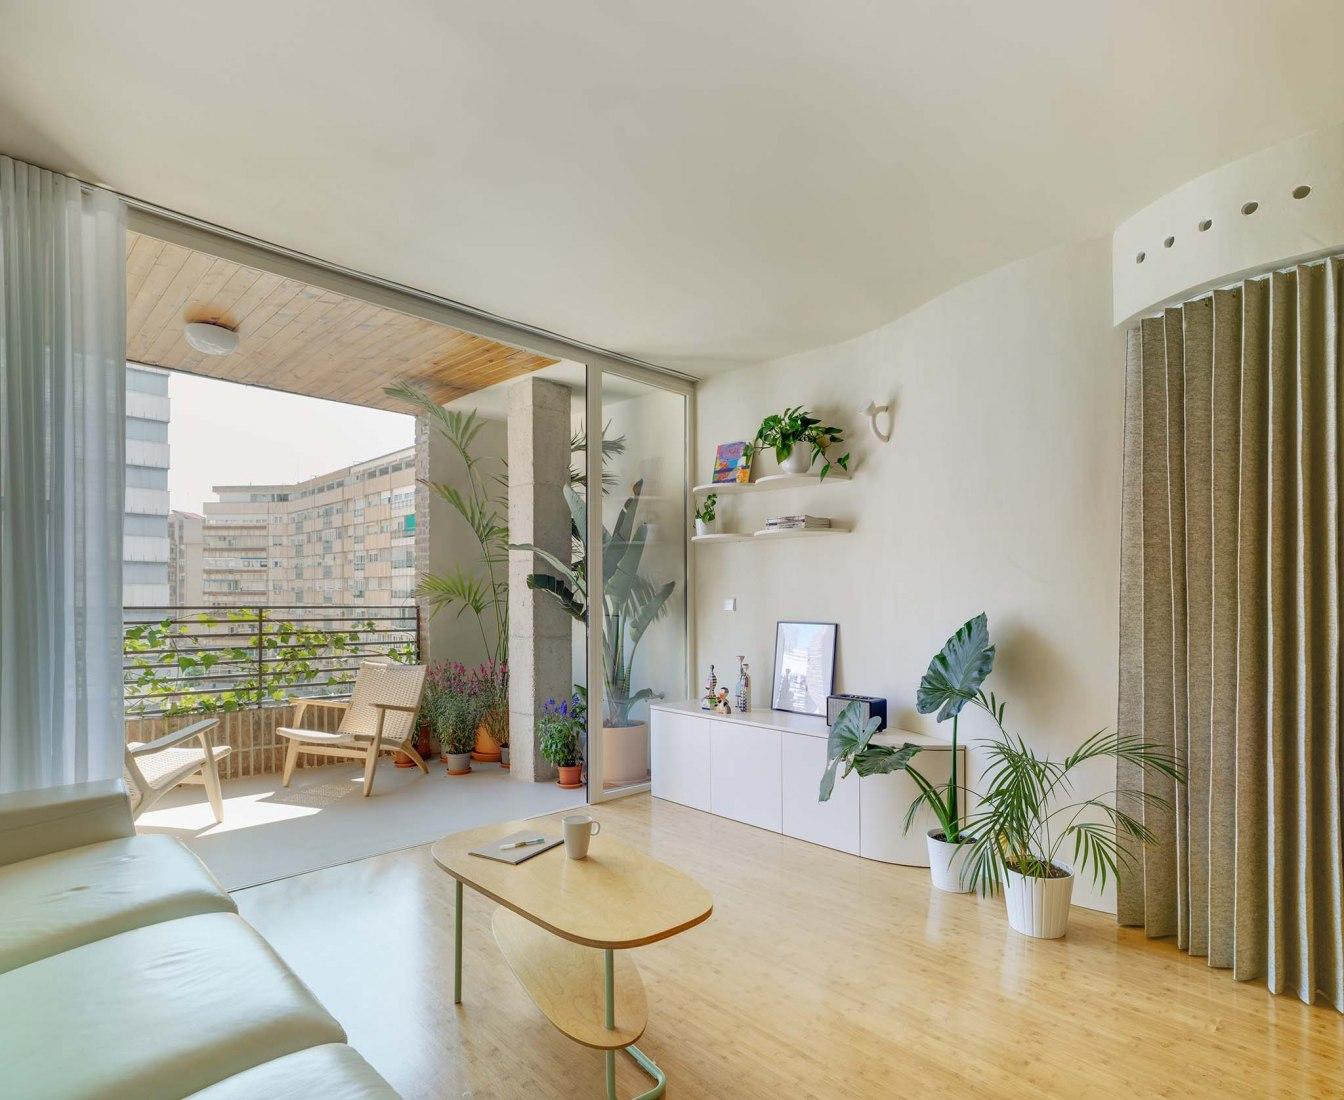 Casa Mo por Laura Ortín Arquitectura. Fotografía por David Frutos.